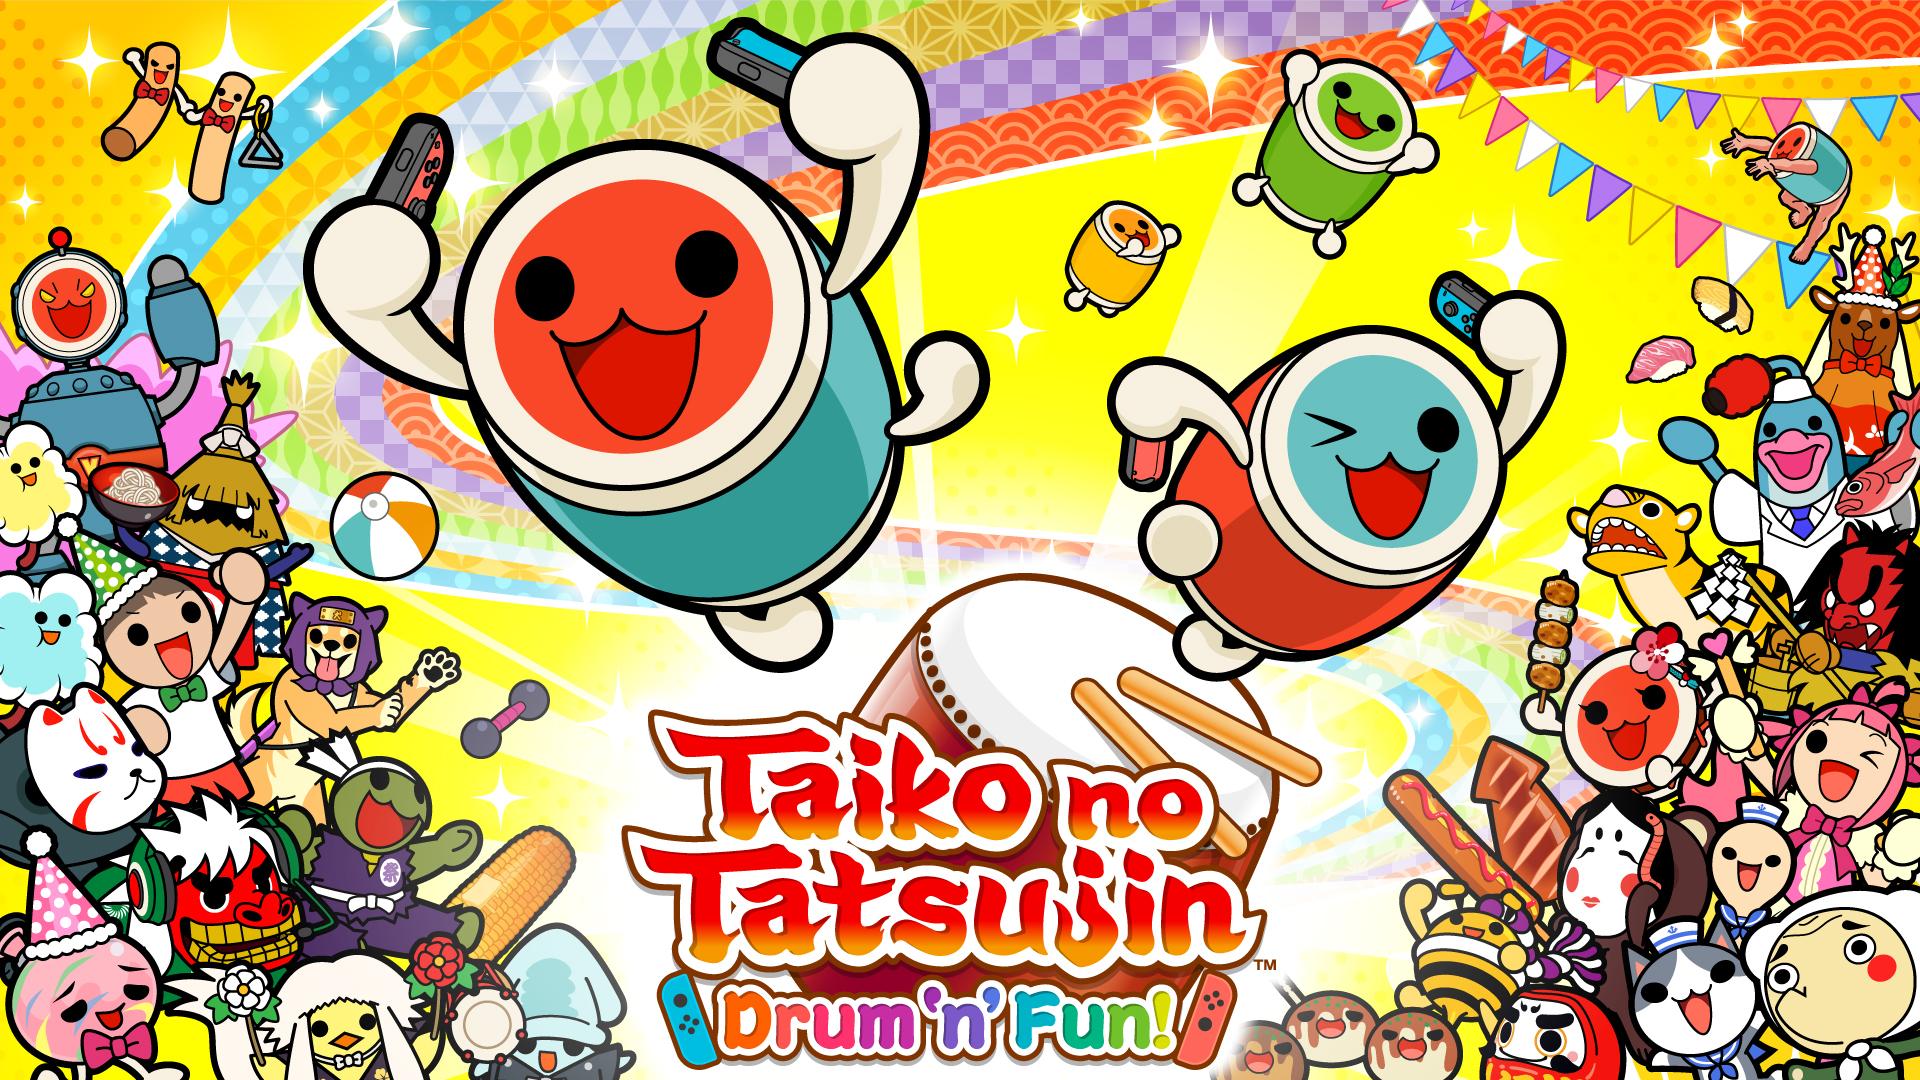 Taiko no Tatsujin: Drum 'n' Fun! Nintendo Switch eShop (US)